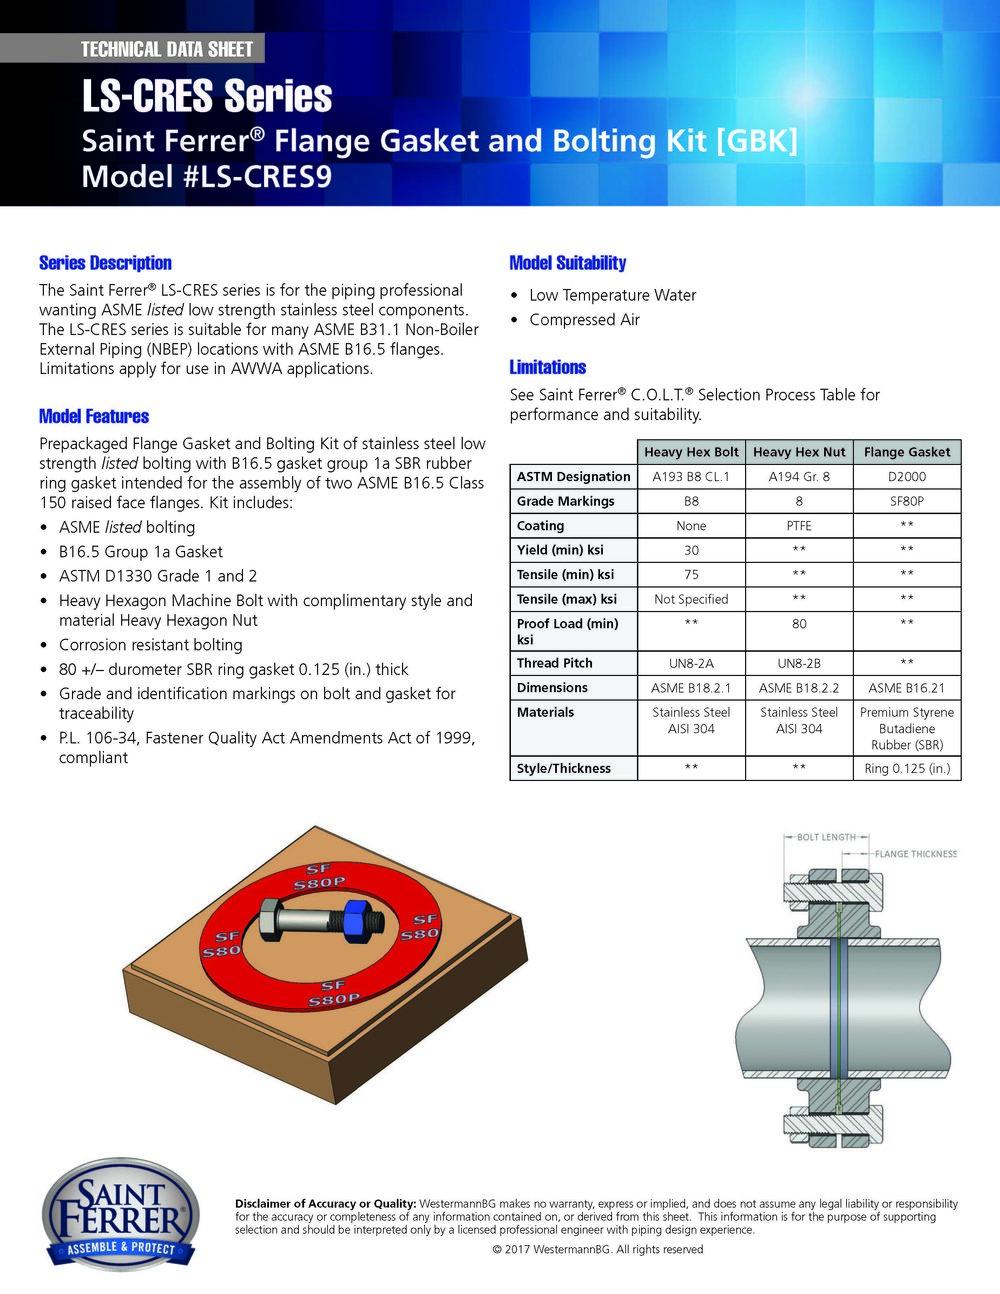 SF_Data_Sheet_LS-CRES_Series_LS-CRES9.jpg